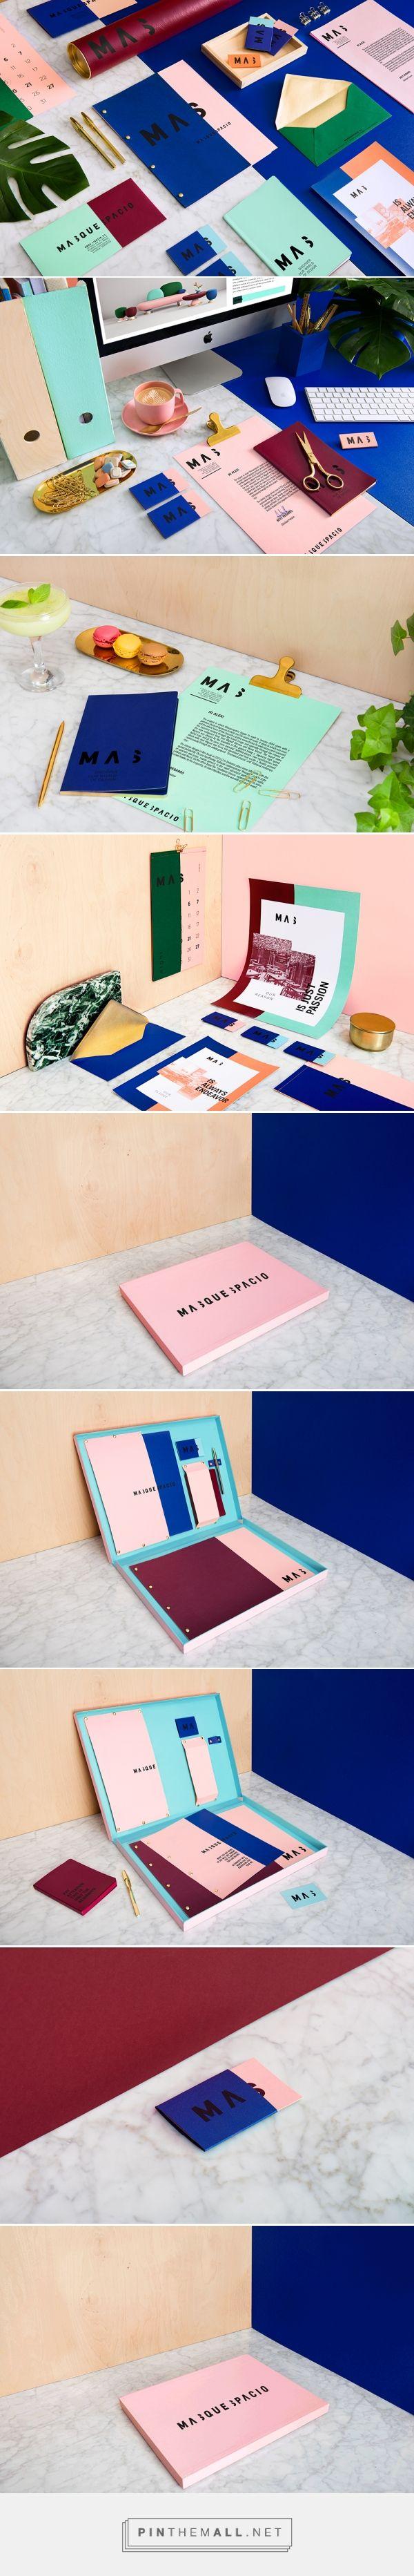 Masquespacio Branding by Masquespacio   Fivestar Branding – Design and Branding Agency & Inspiration Gallery